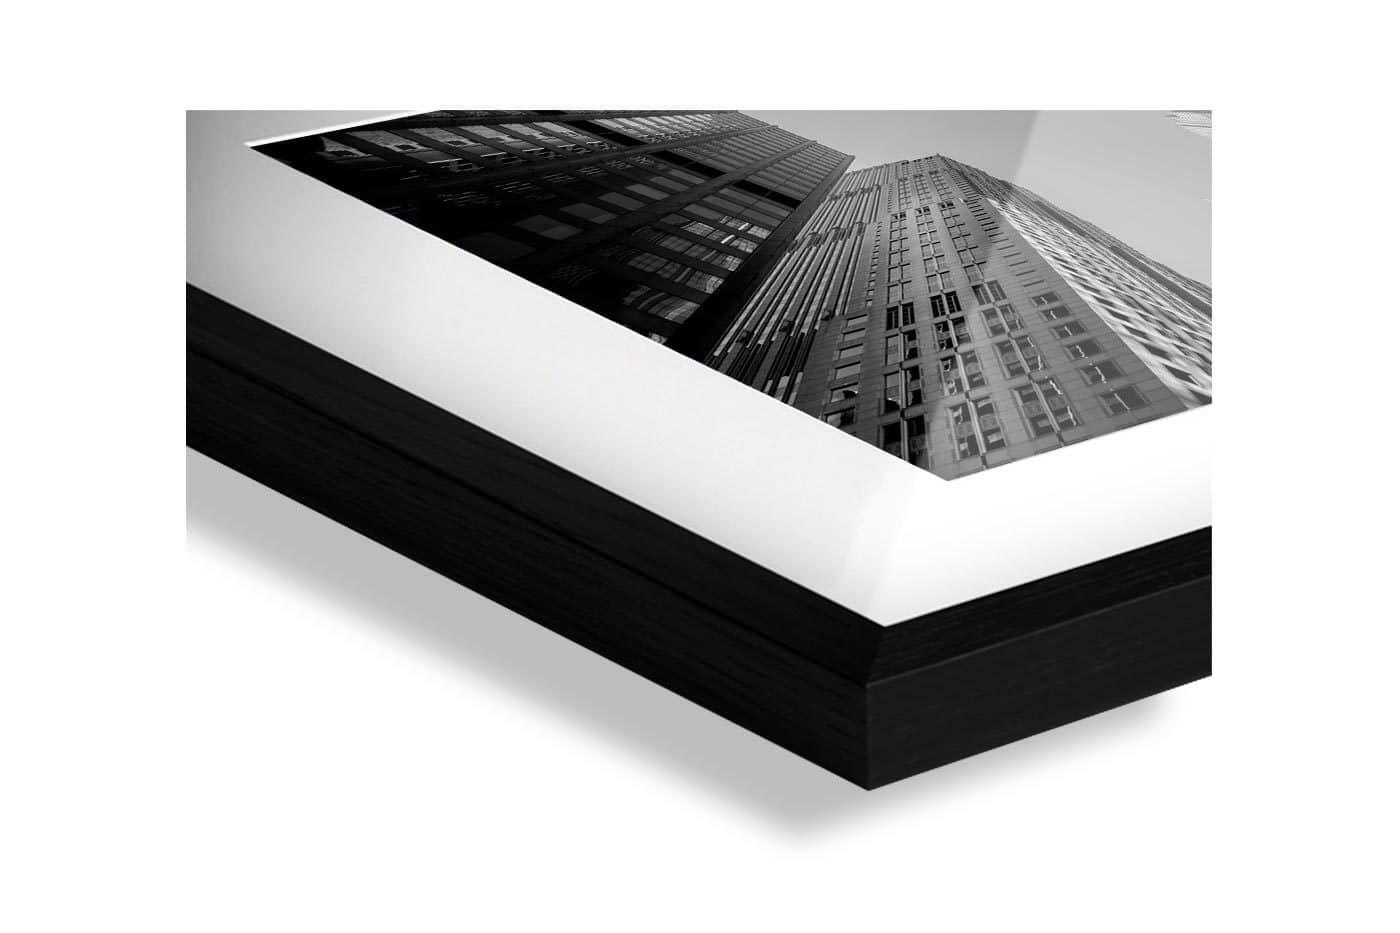 Profil cadre galerie Glass Buildings